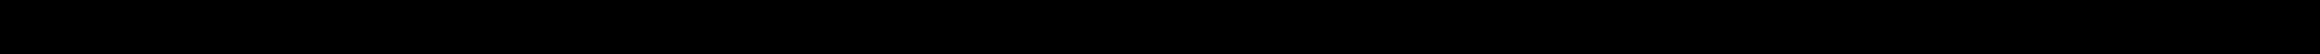 METZGER 6405 L7, 1334799080 Лостов механизъм на чистачките